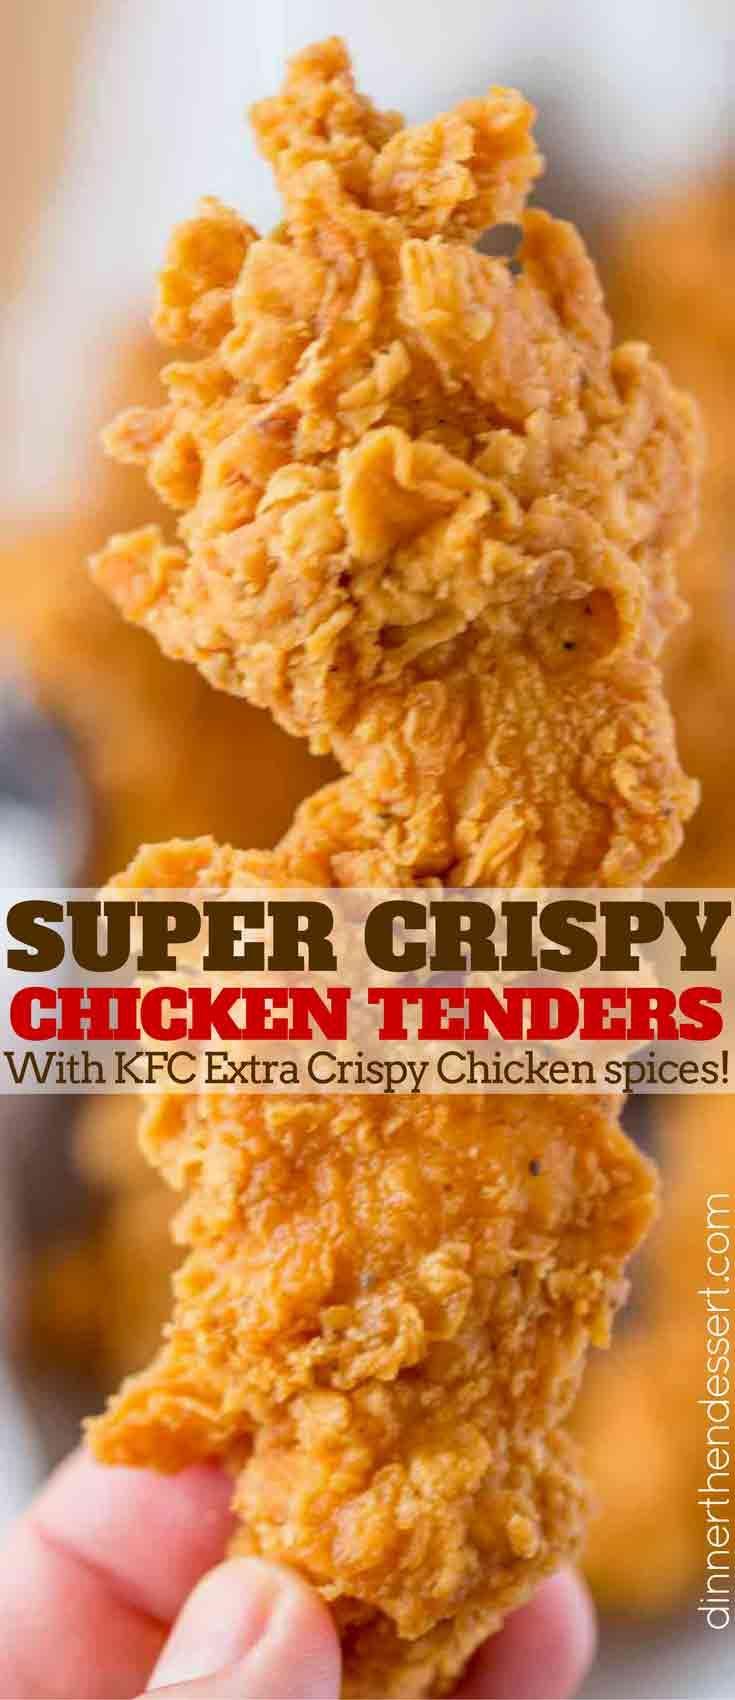 Crispy Chicken Tenders Marinaded In Buttermilk Then Fried Or Oven Baked Golden Brown Ar Chicken Tenders Dinner Crispy Chicken Recipes Crispy Chicken Tenders